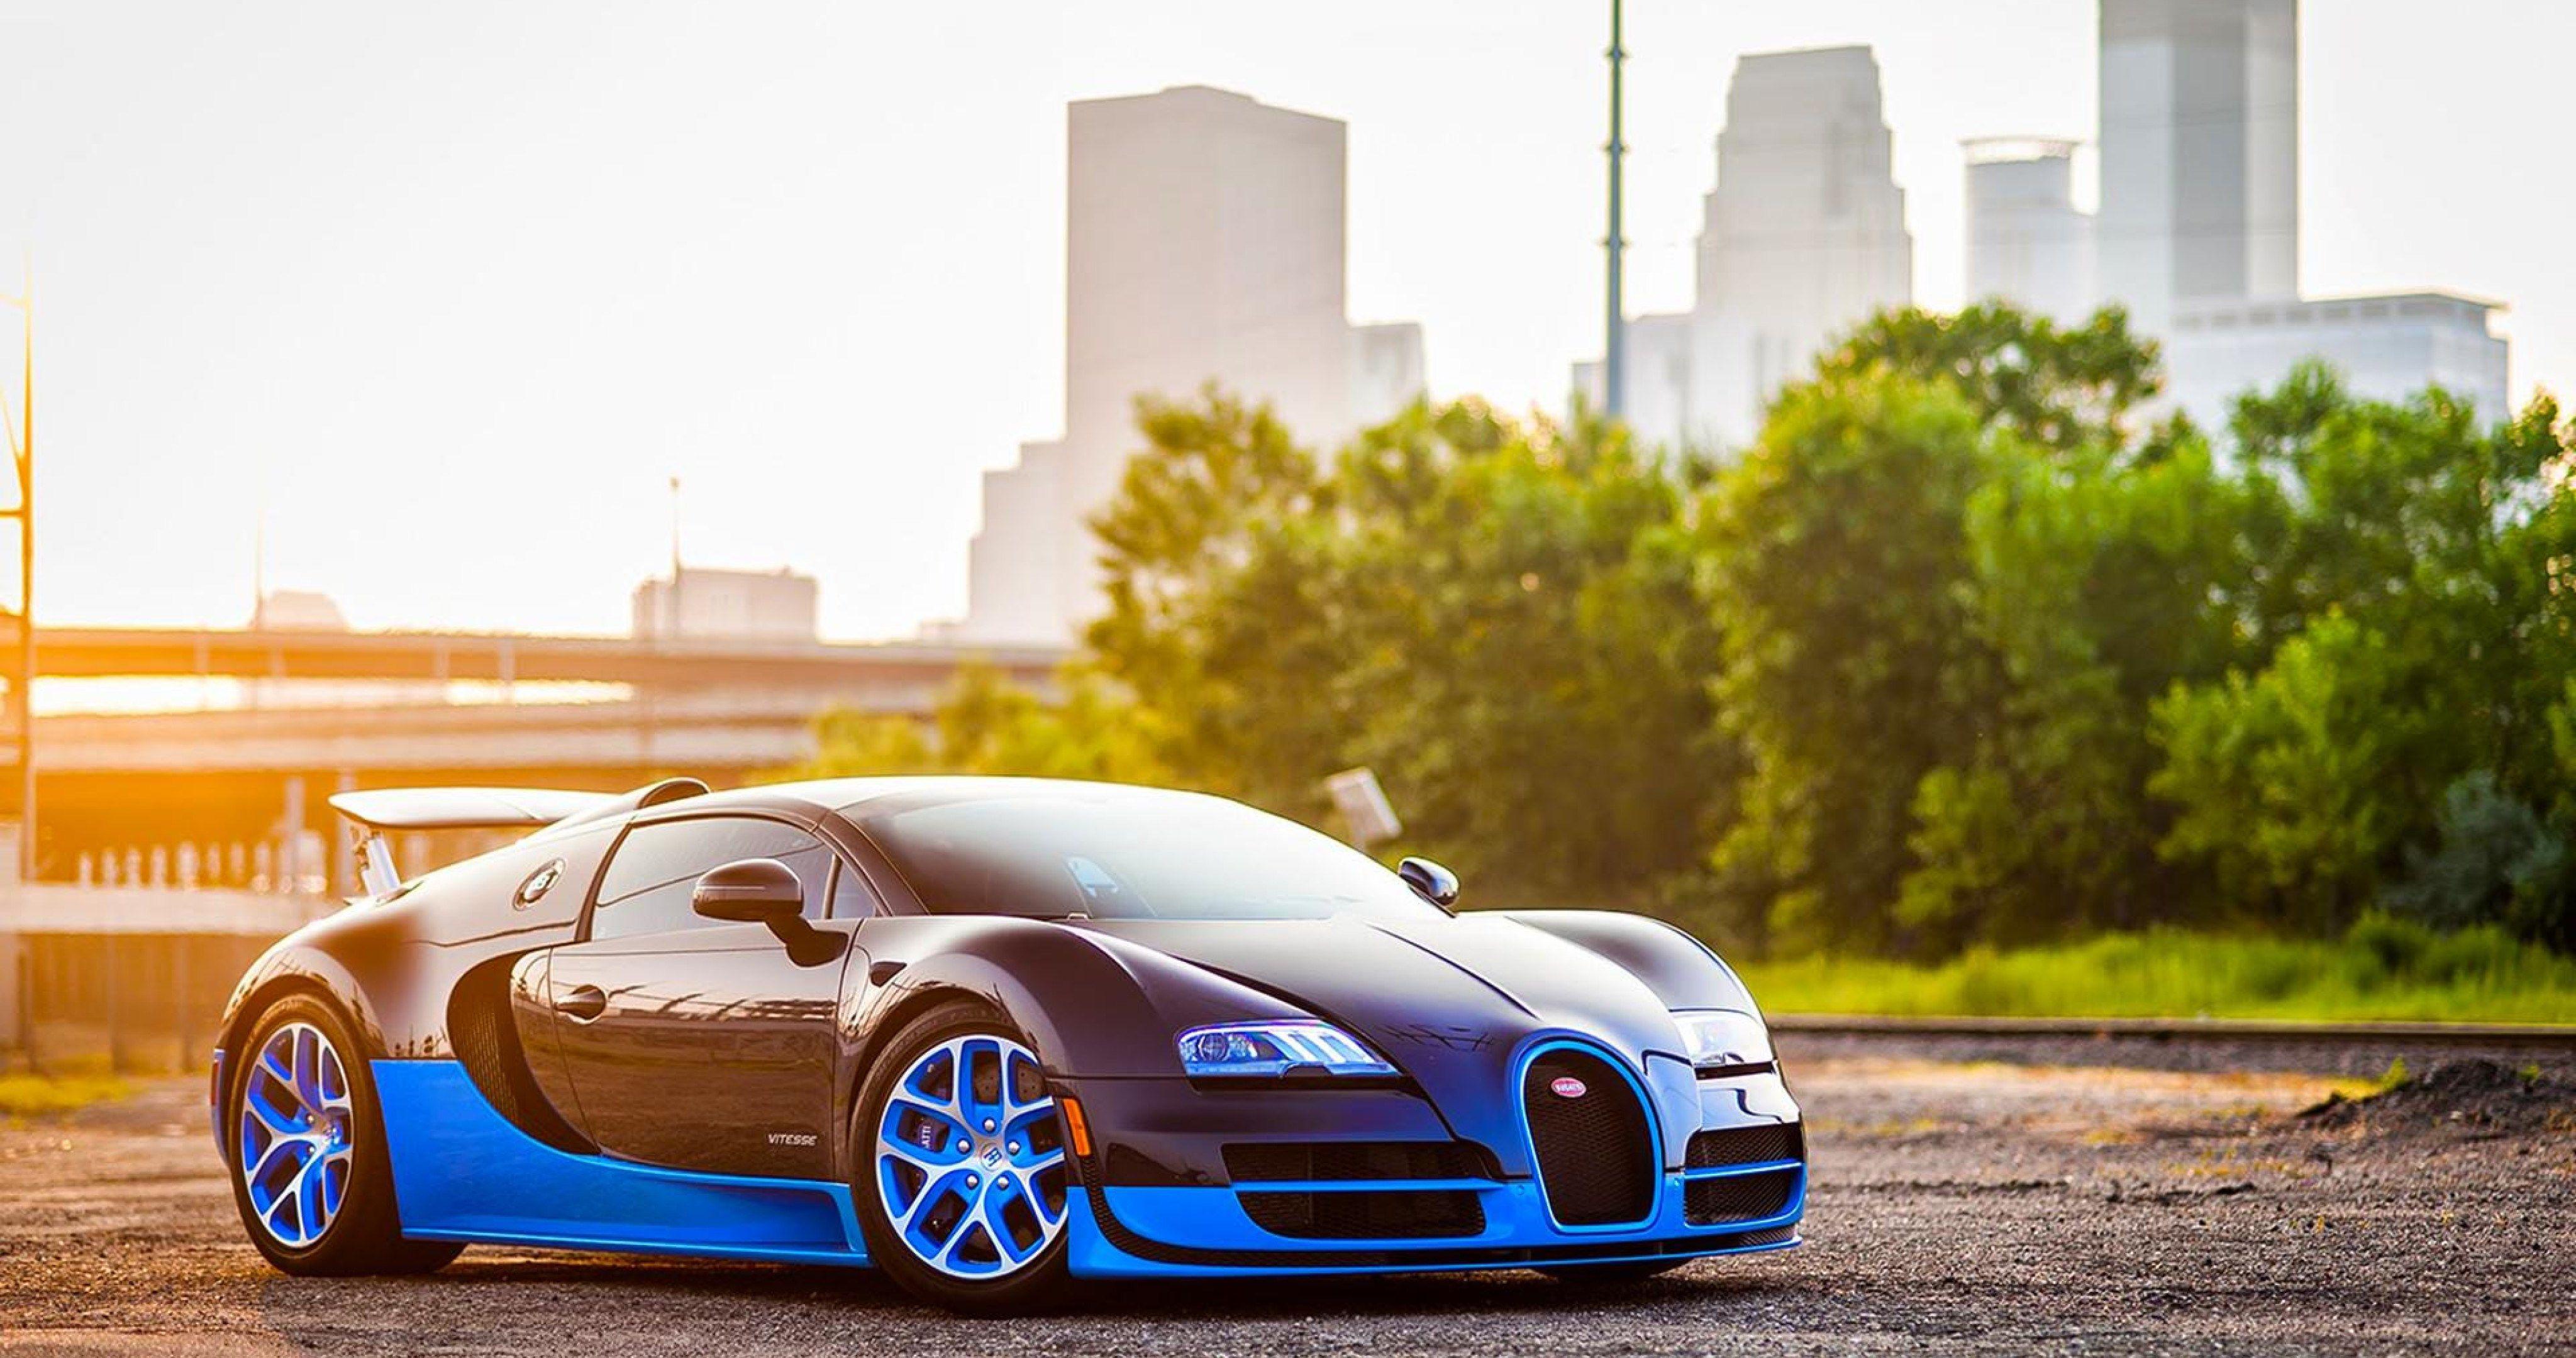 0d3c3663f064e617c3b80a05b2b896eb Fascinating Bugatti Veyron Grand Sport Vitesse 1/4 Mile Cars Trend